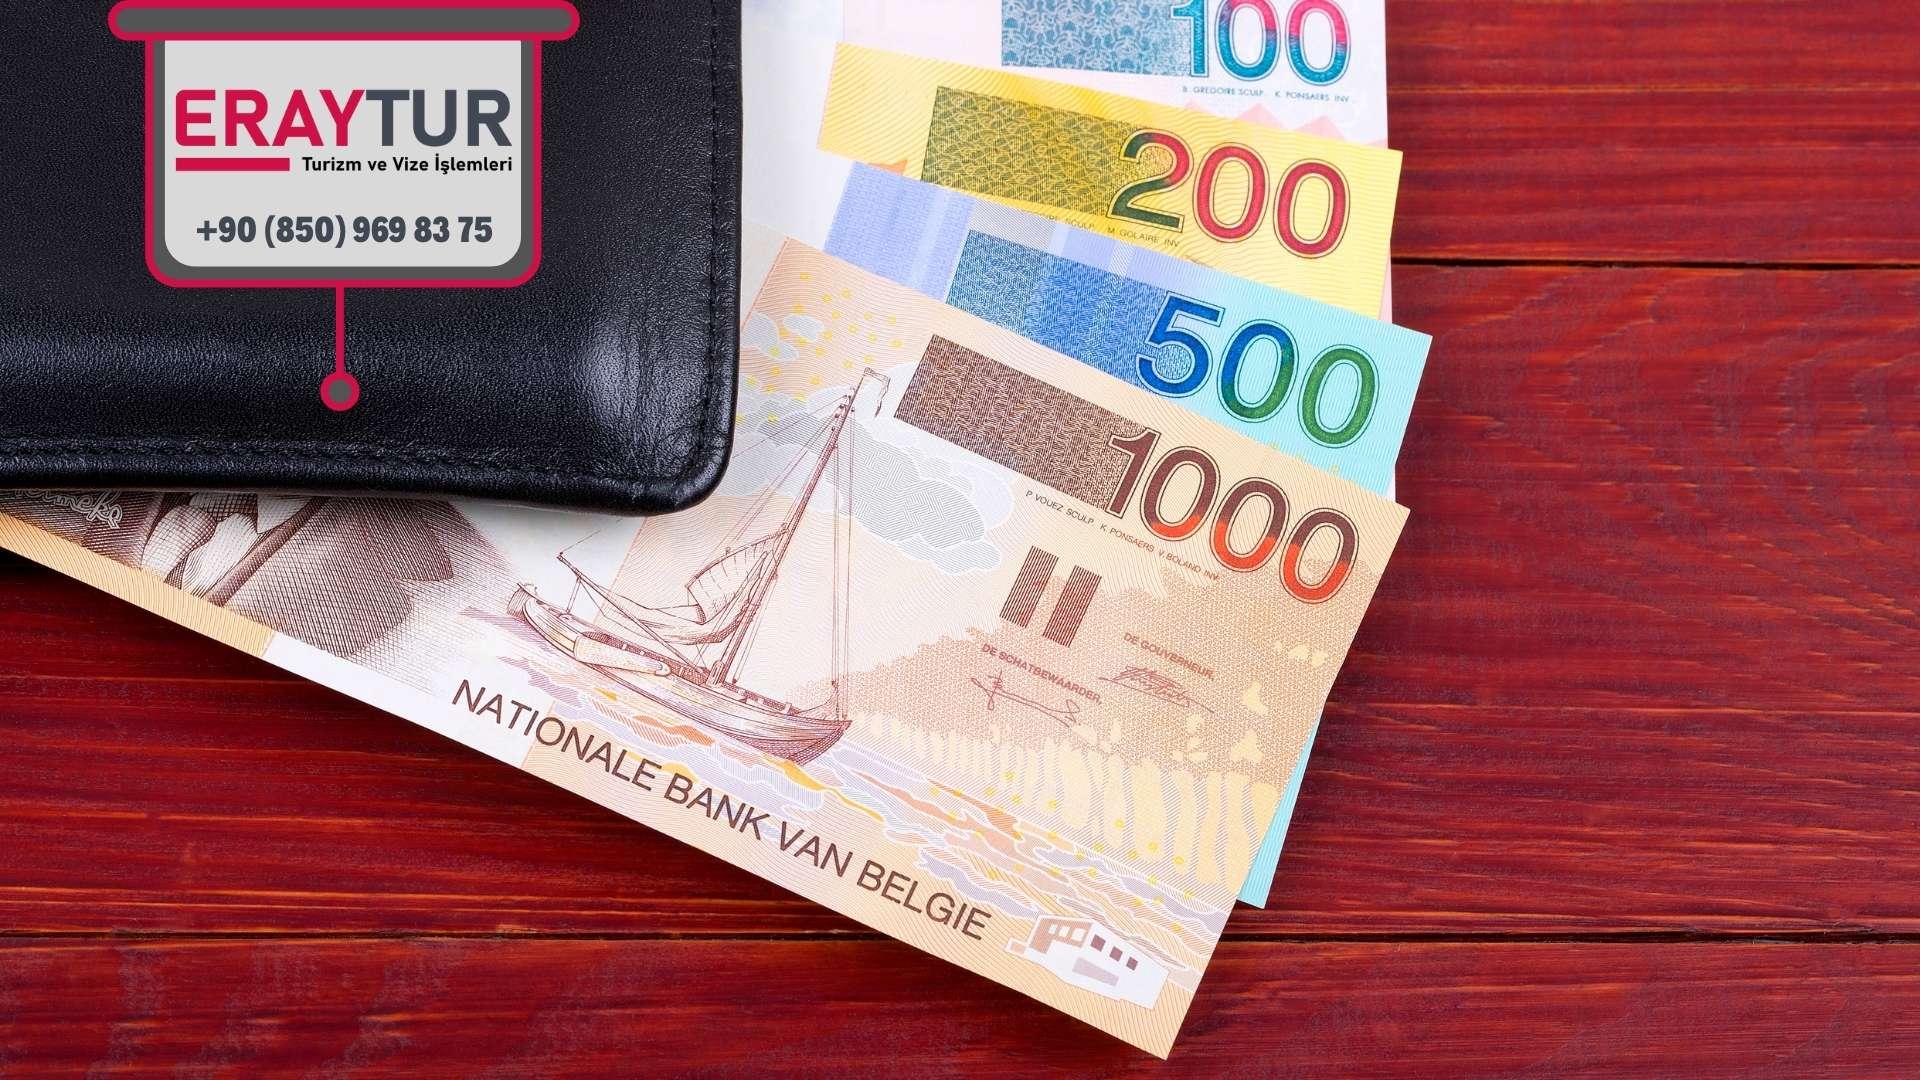 Belçika Turistik Vize Ücretleri